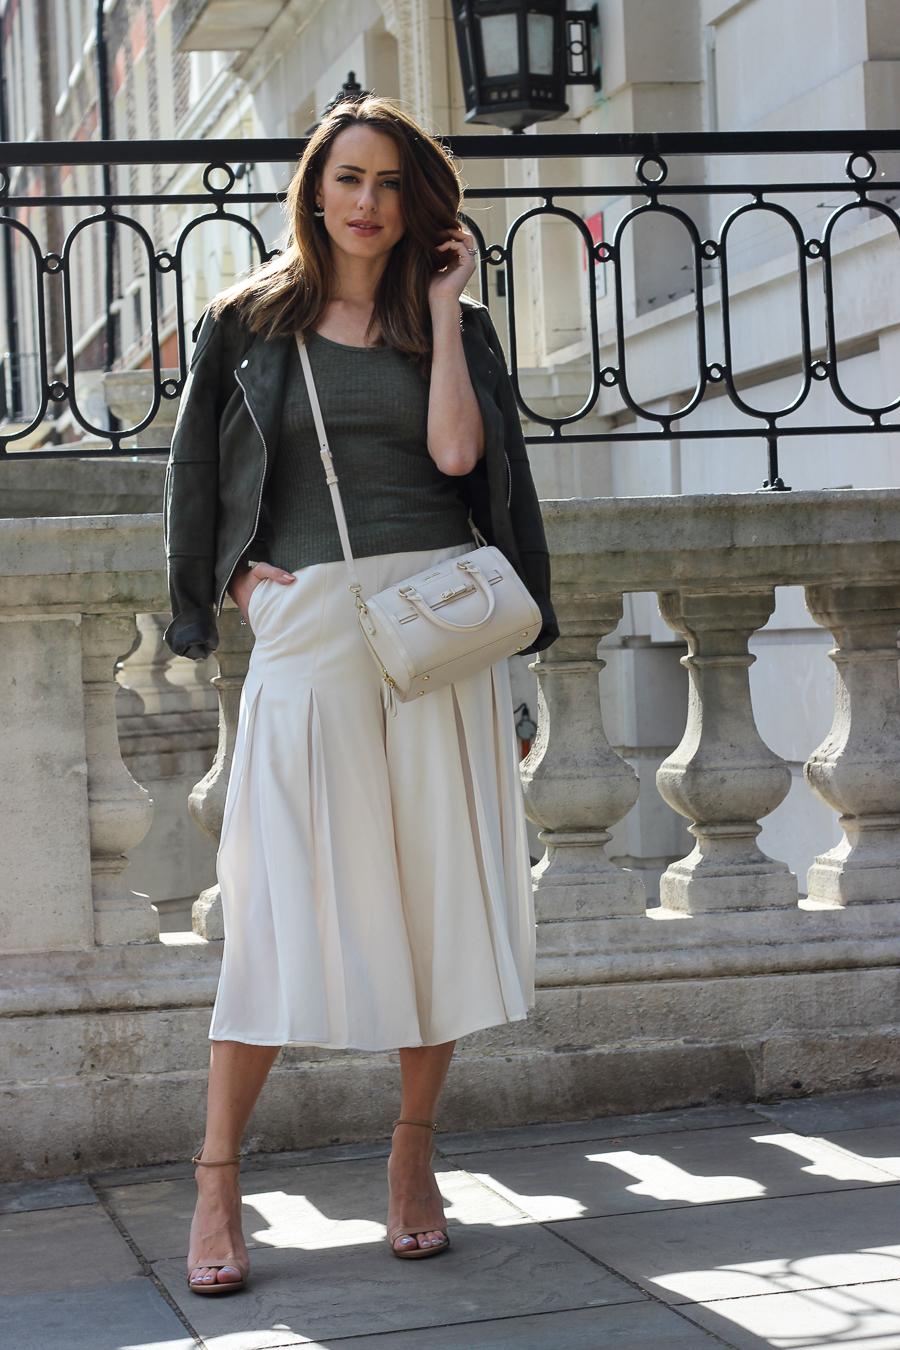 Folli Follie UK - Clutch and carry on - uk travel blogger, uk fashion blogger, london street style, sabrina chakici tblogger-33